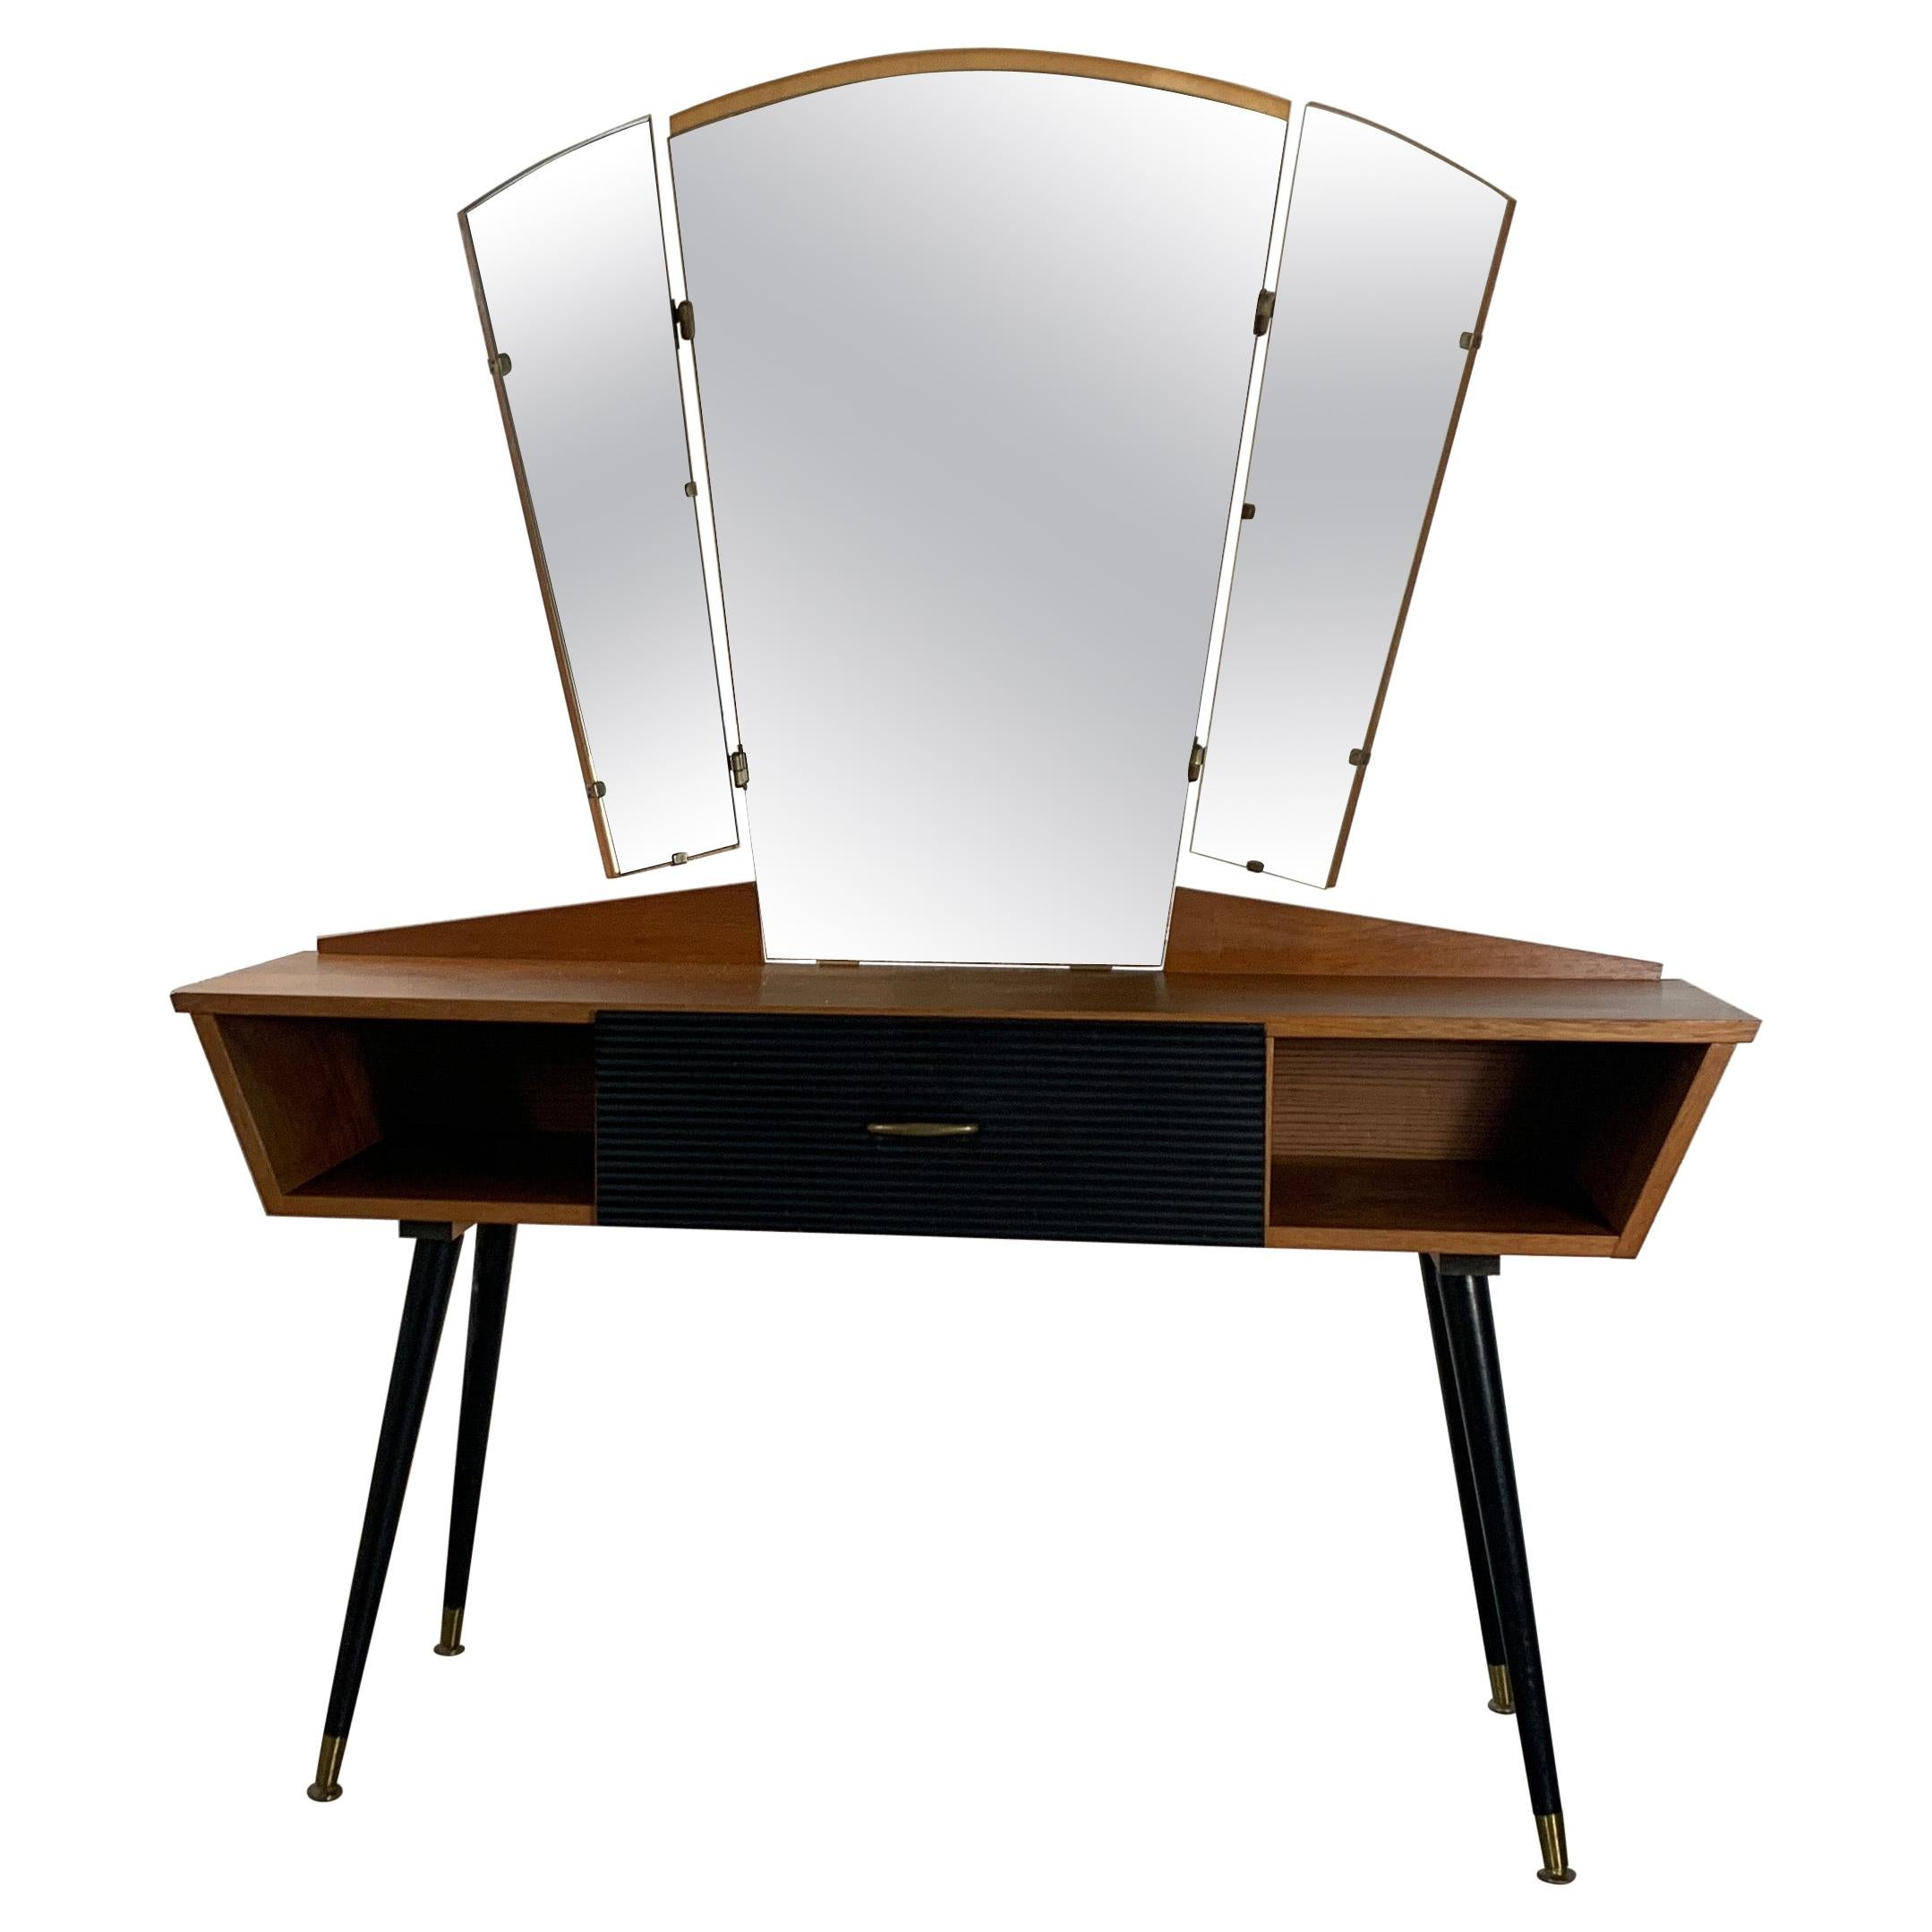 20th Century Italian Vintage Dressing Table Teak and Brass, 1950s